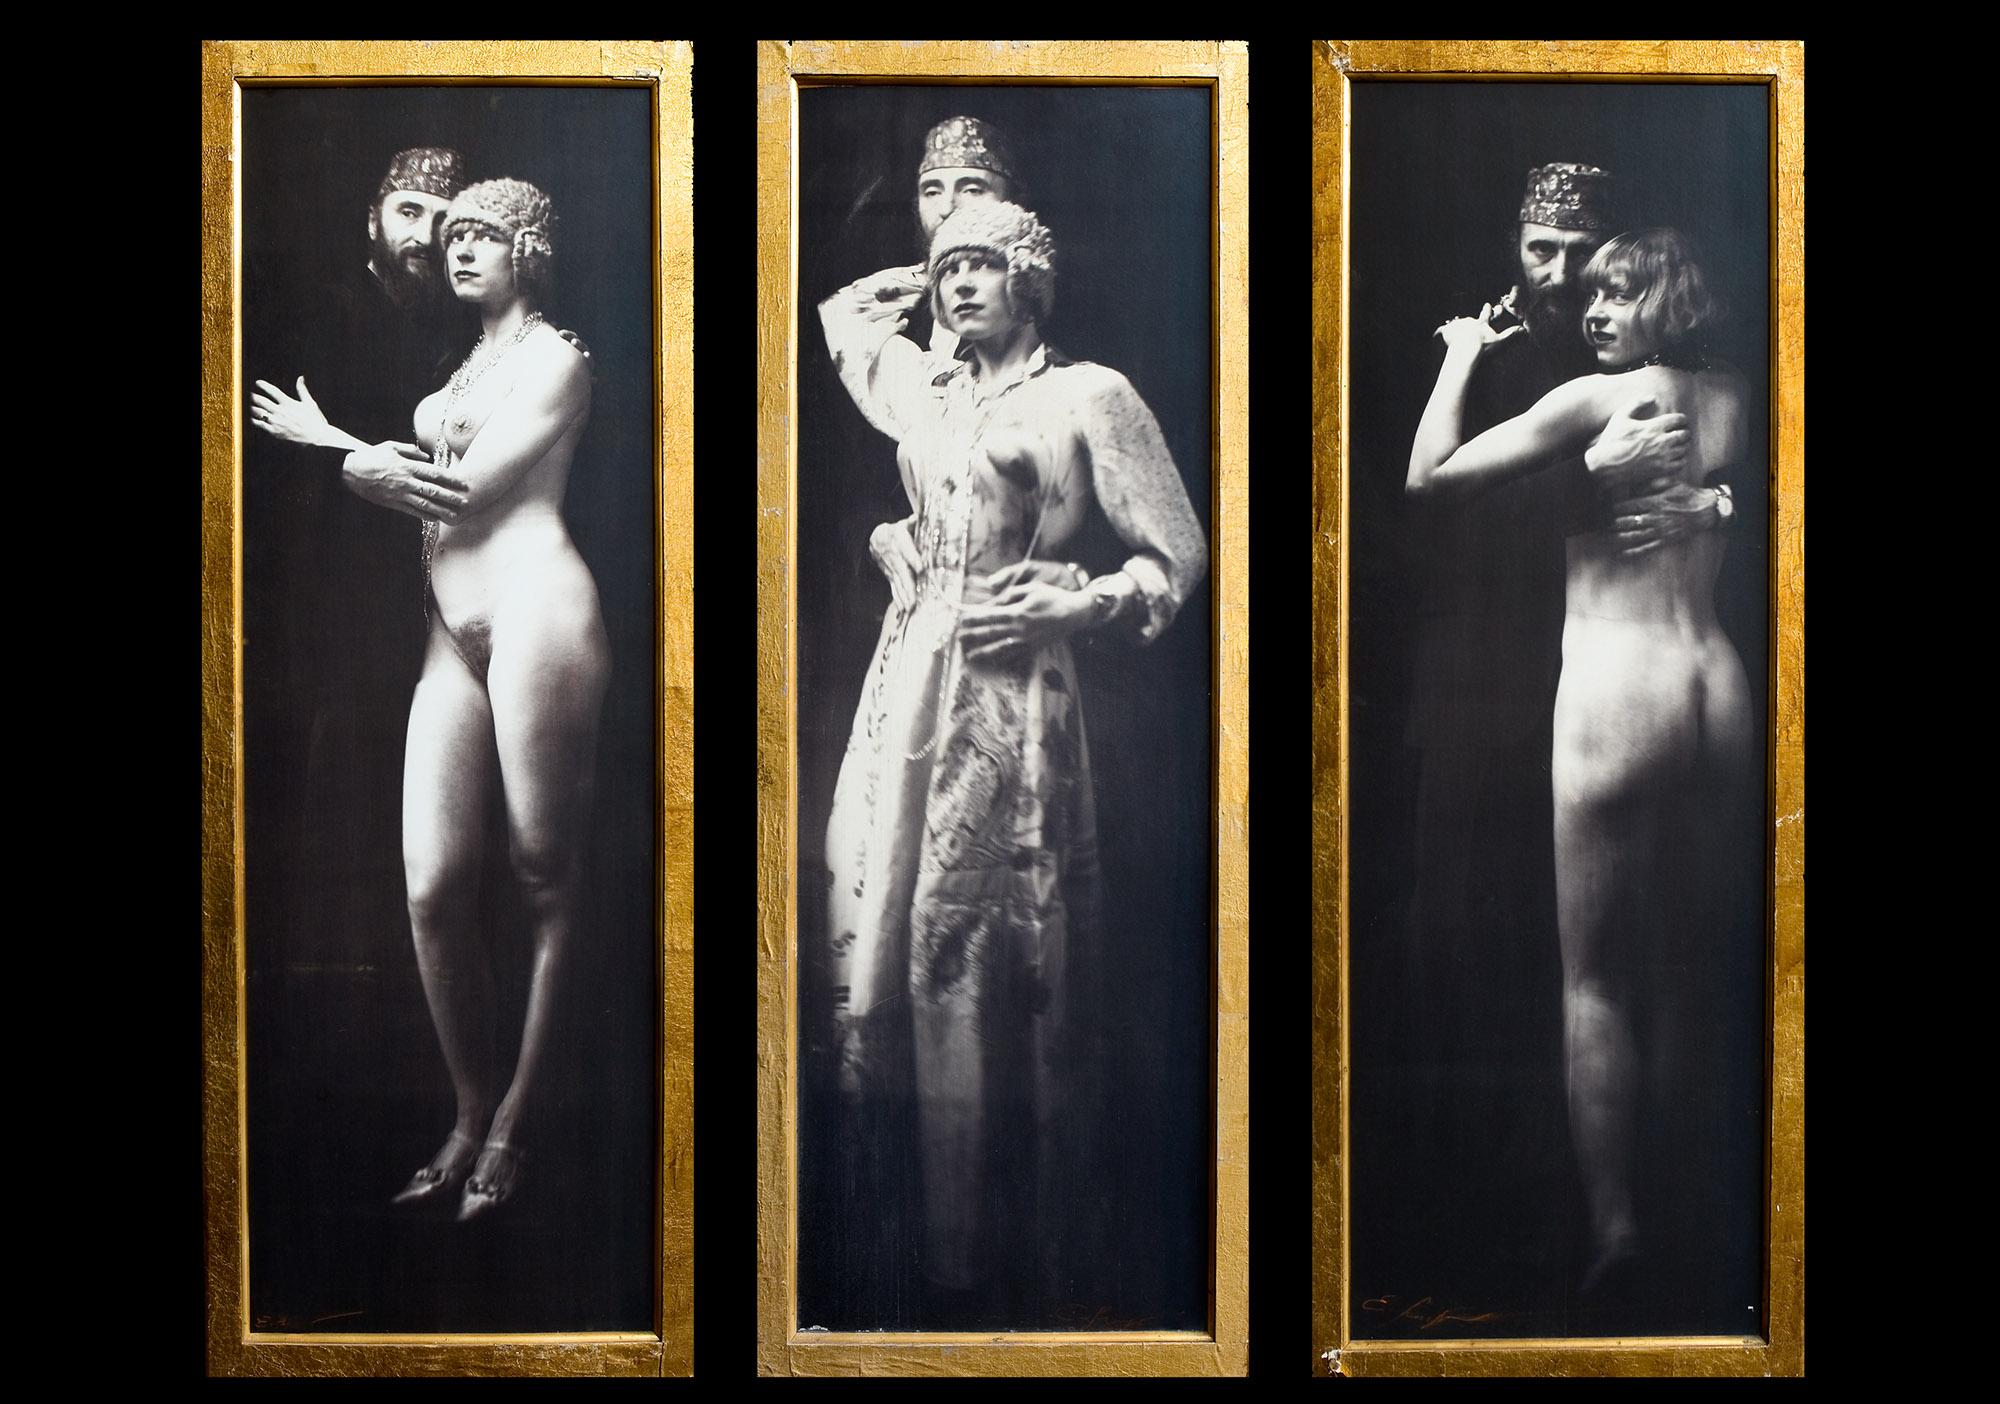 IMAGO Camera Ernst Fuchs Portraitserie 1976